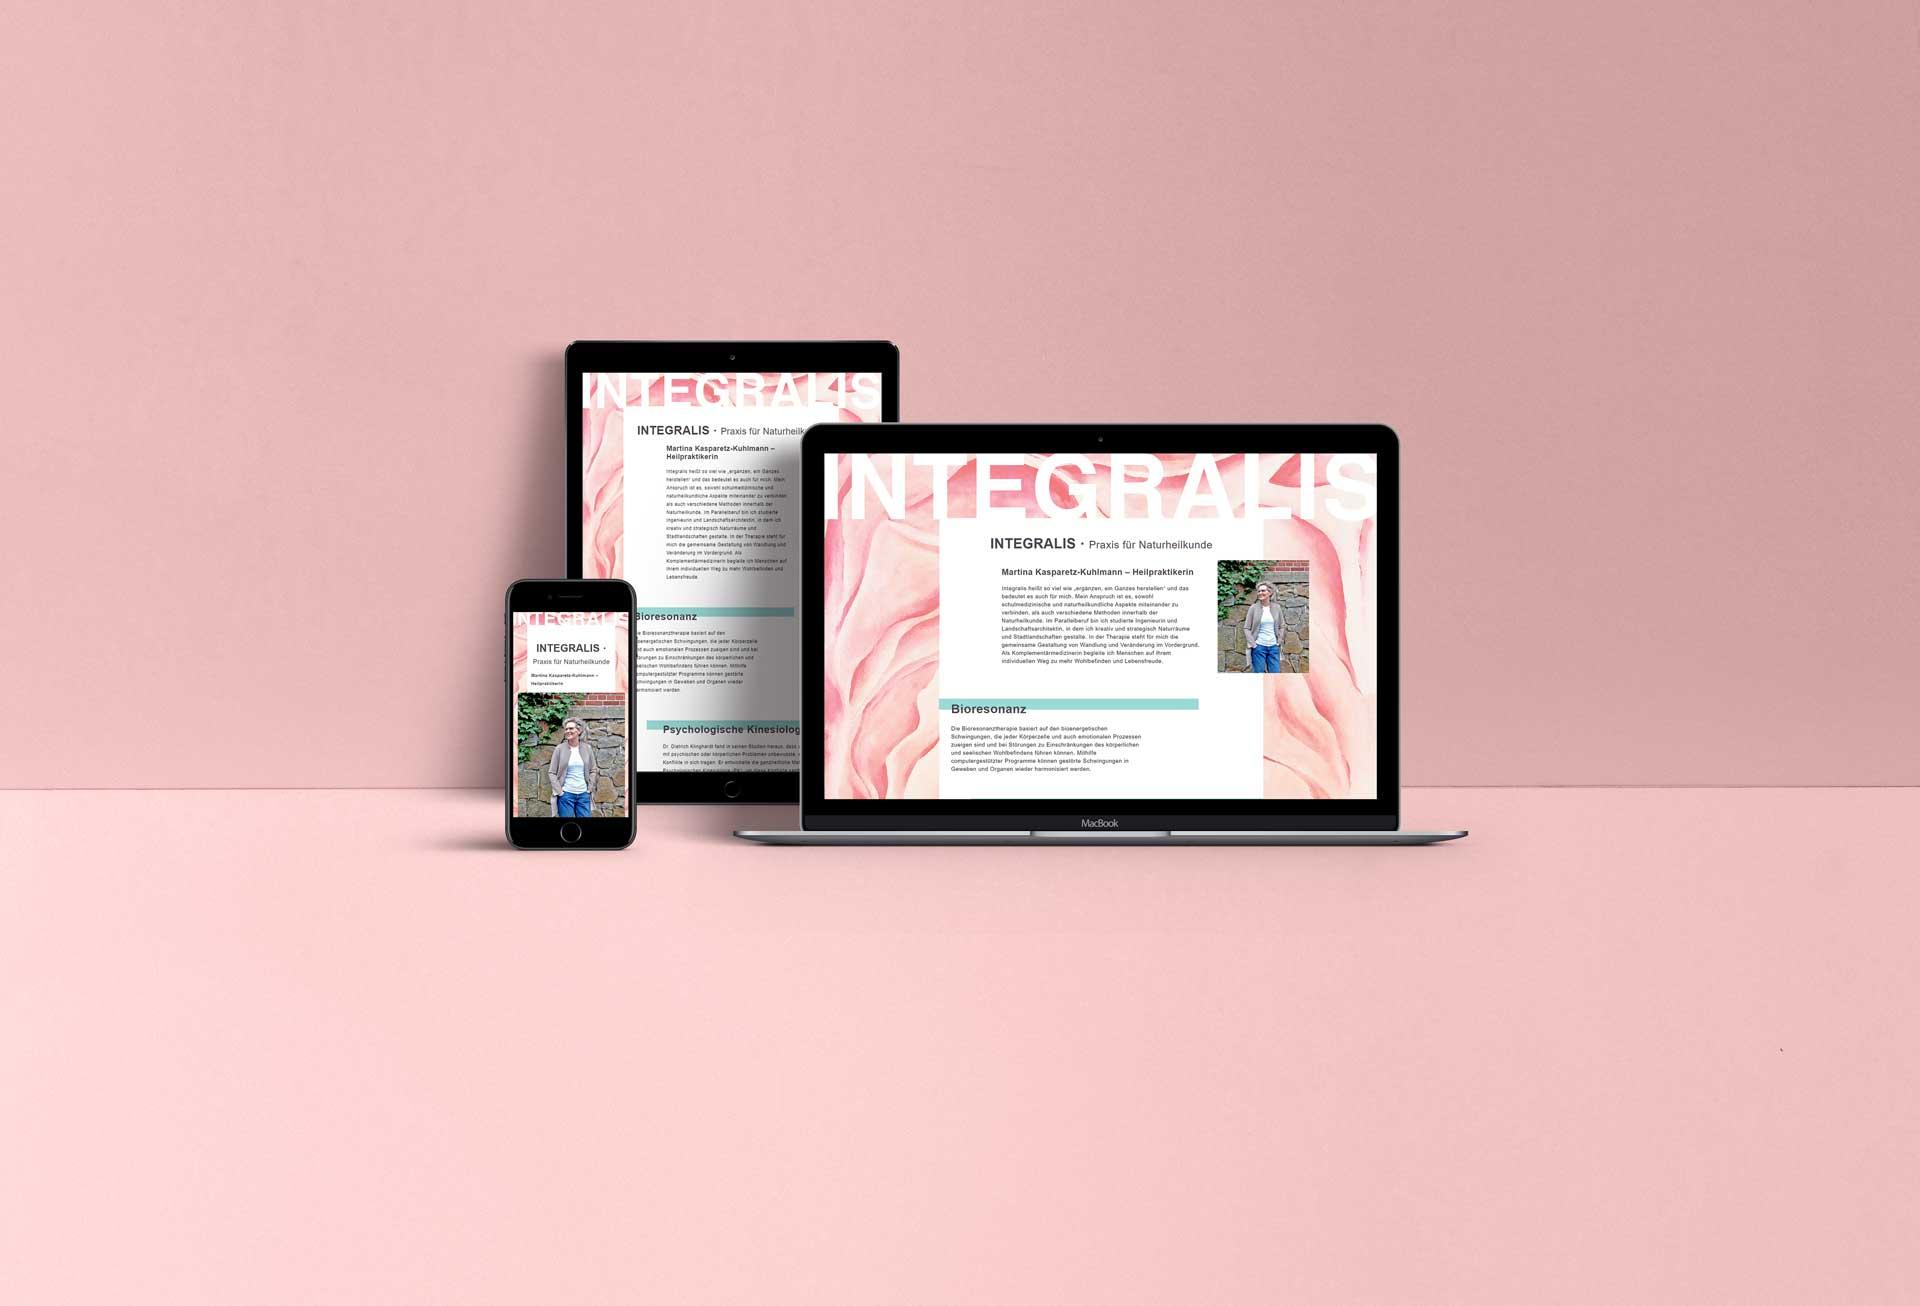 Praxis Integralis - Responsive Design